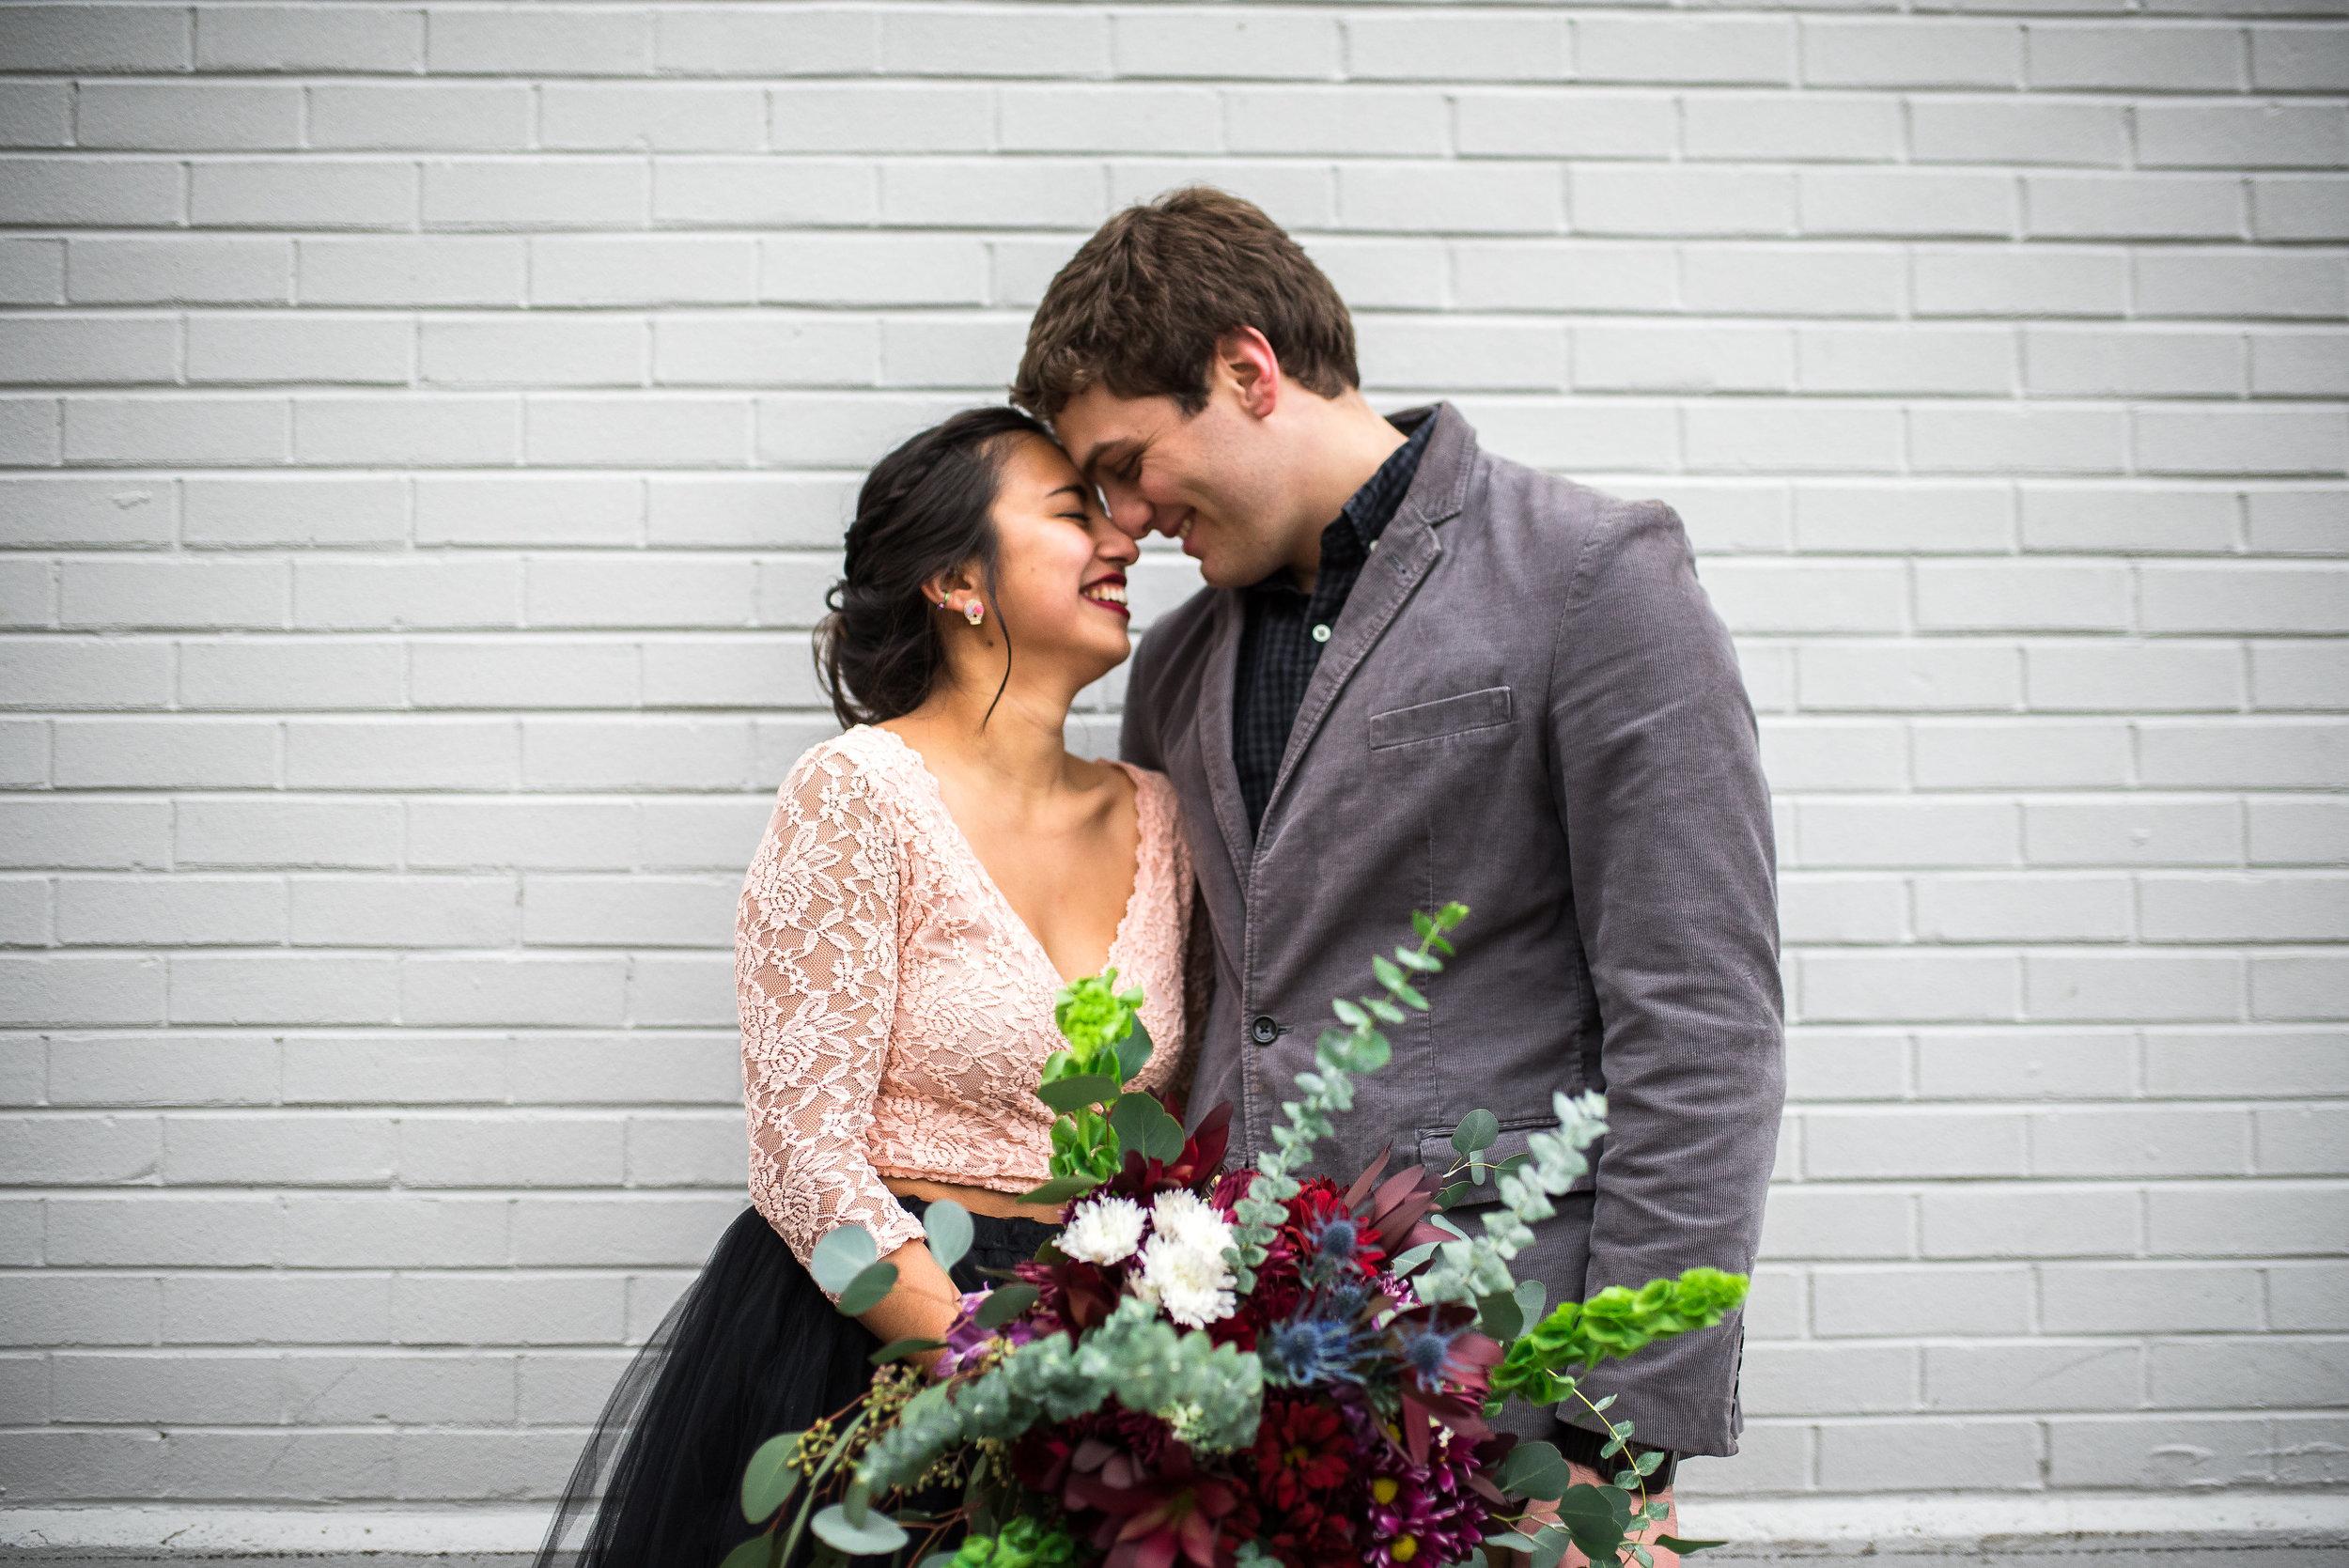 Raleigh Wedding Photographer - Raleigh courthouse wedding - New England Wedding Photographer - Boston Wedding Photographer